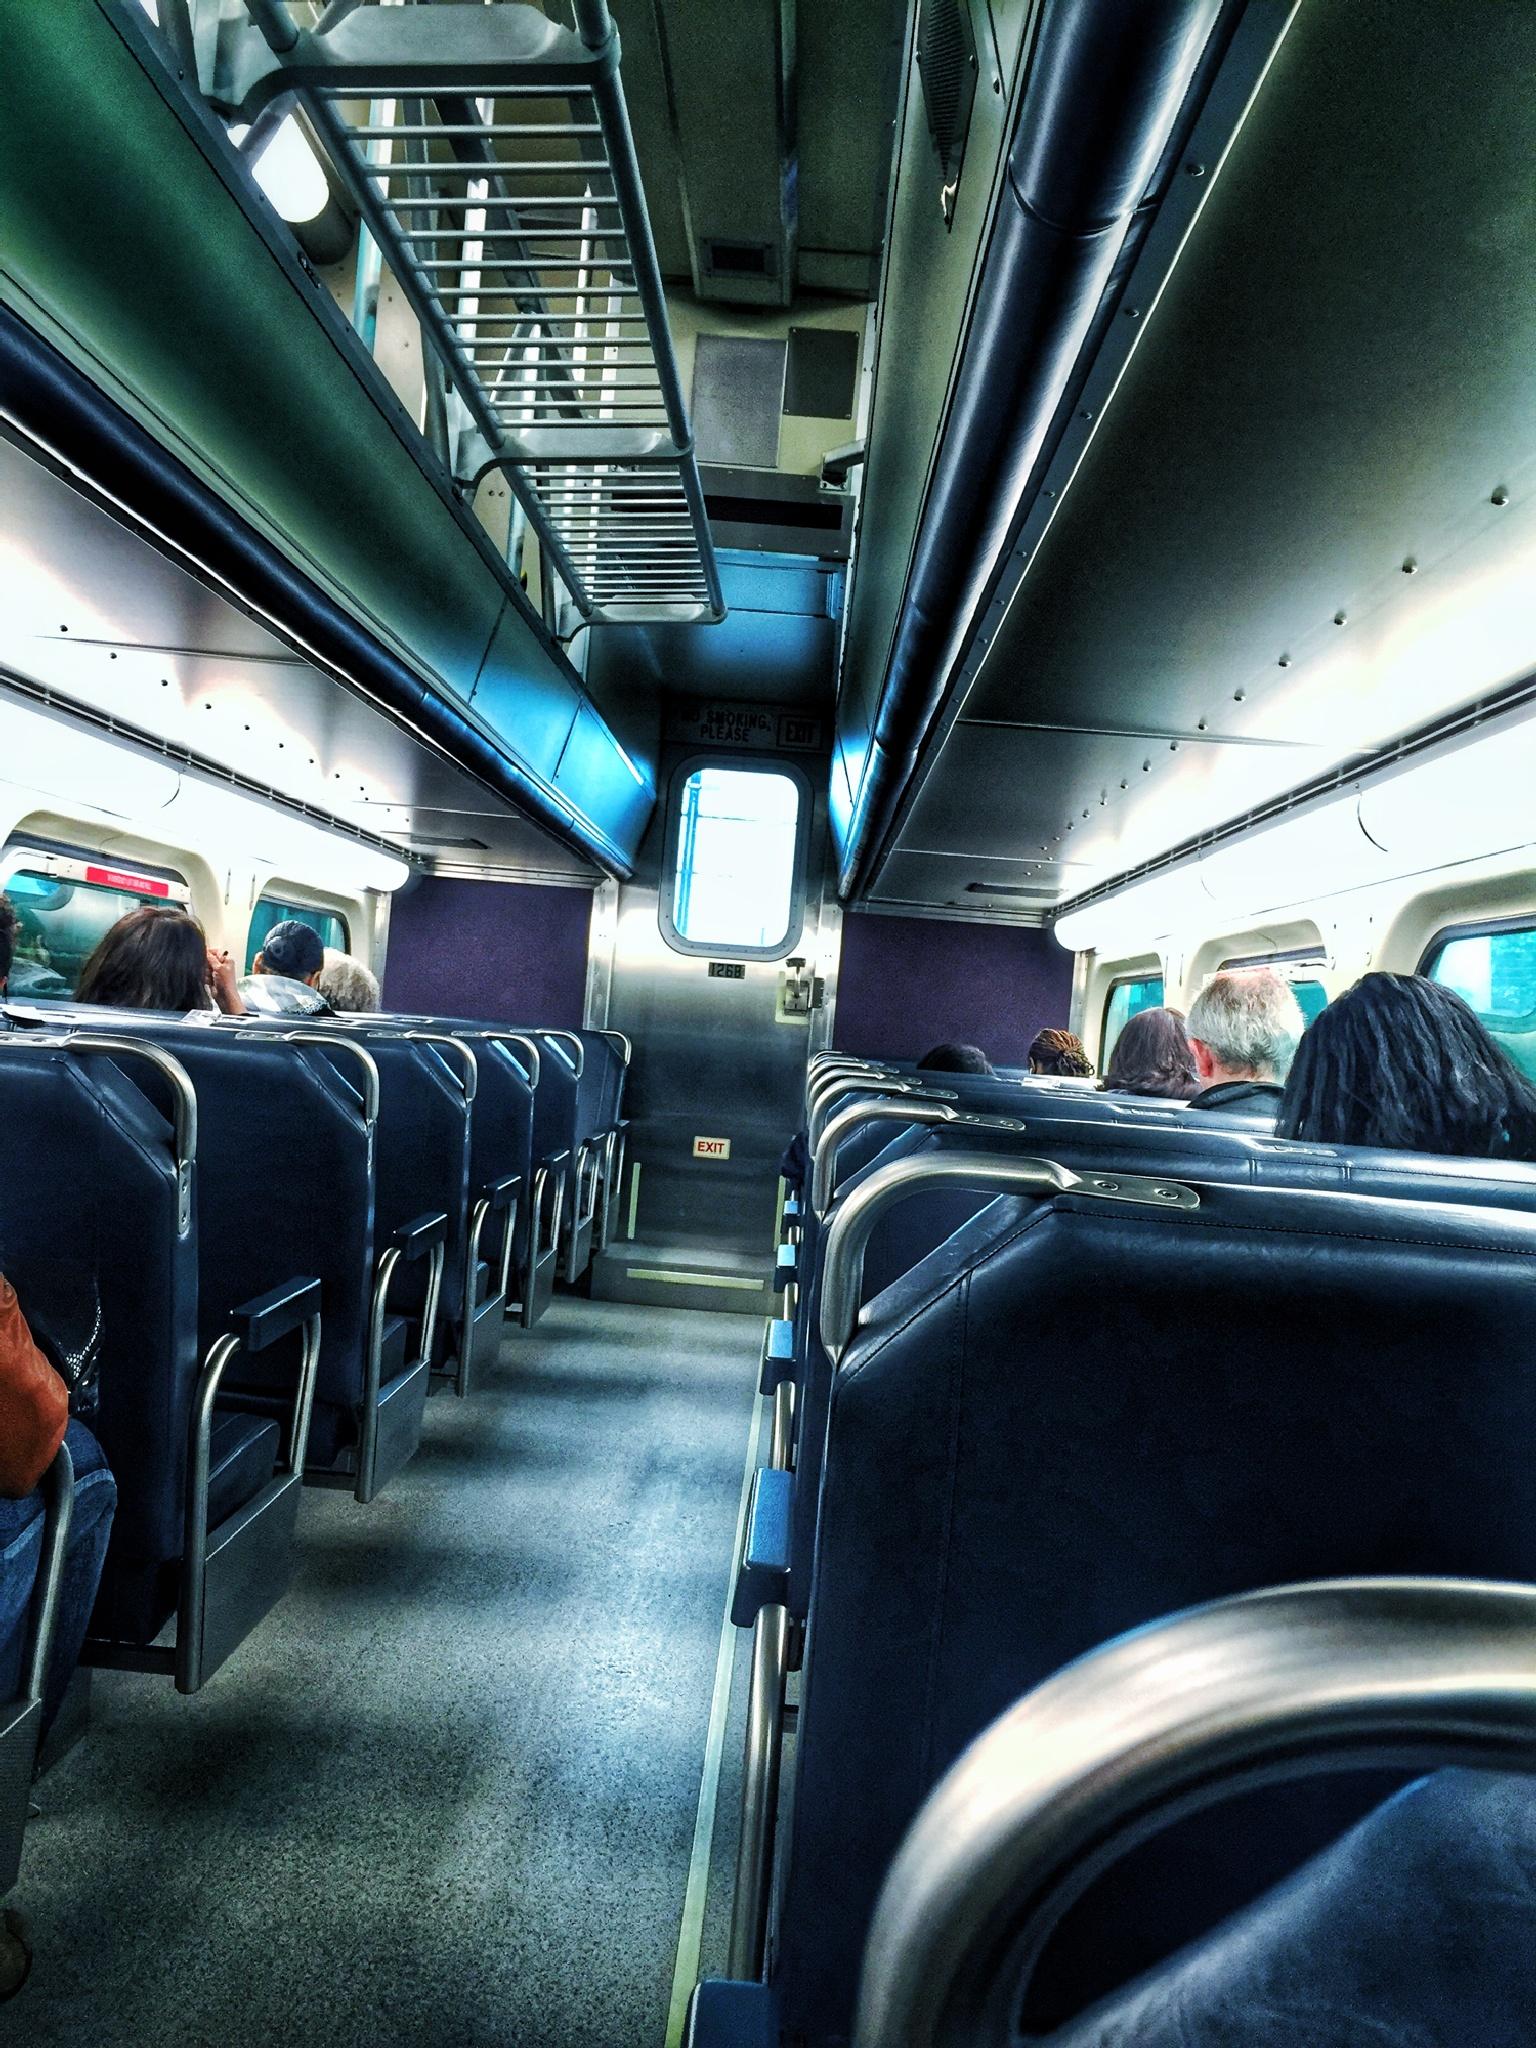 Commuting Blues by rickferris